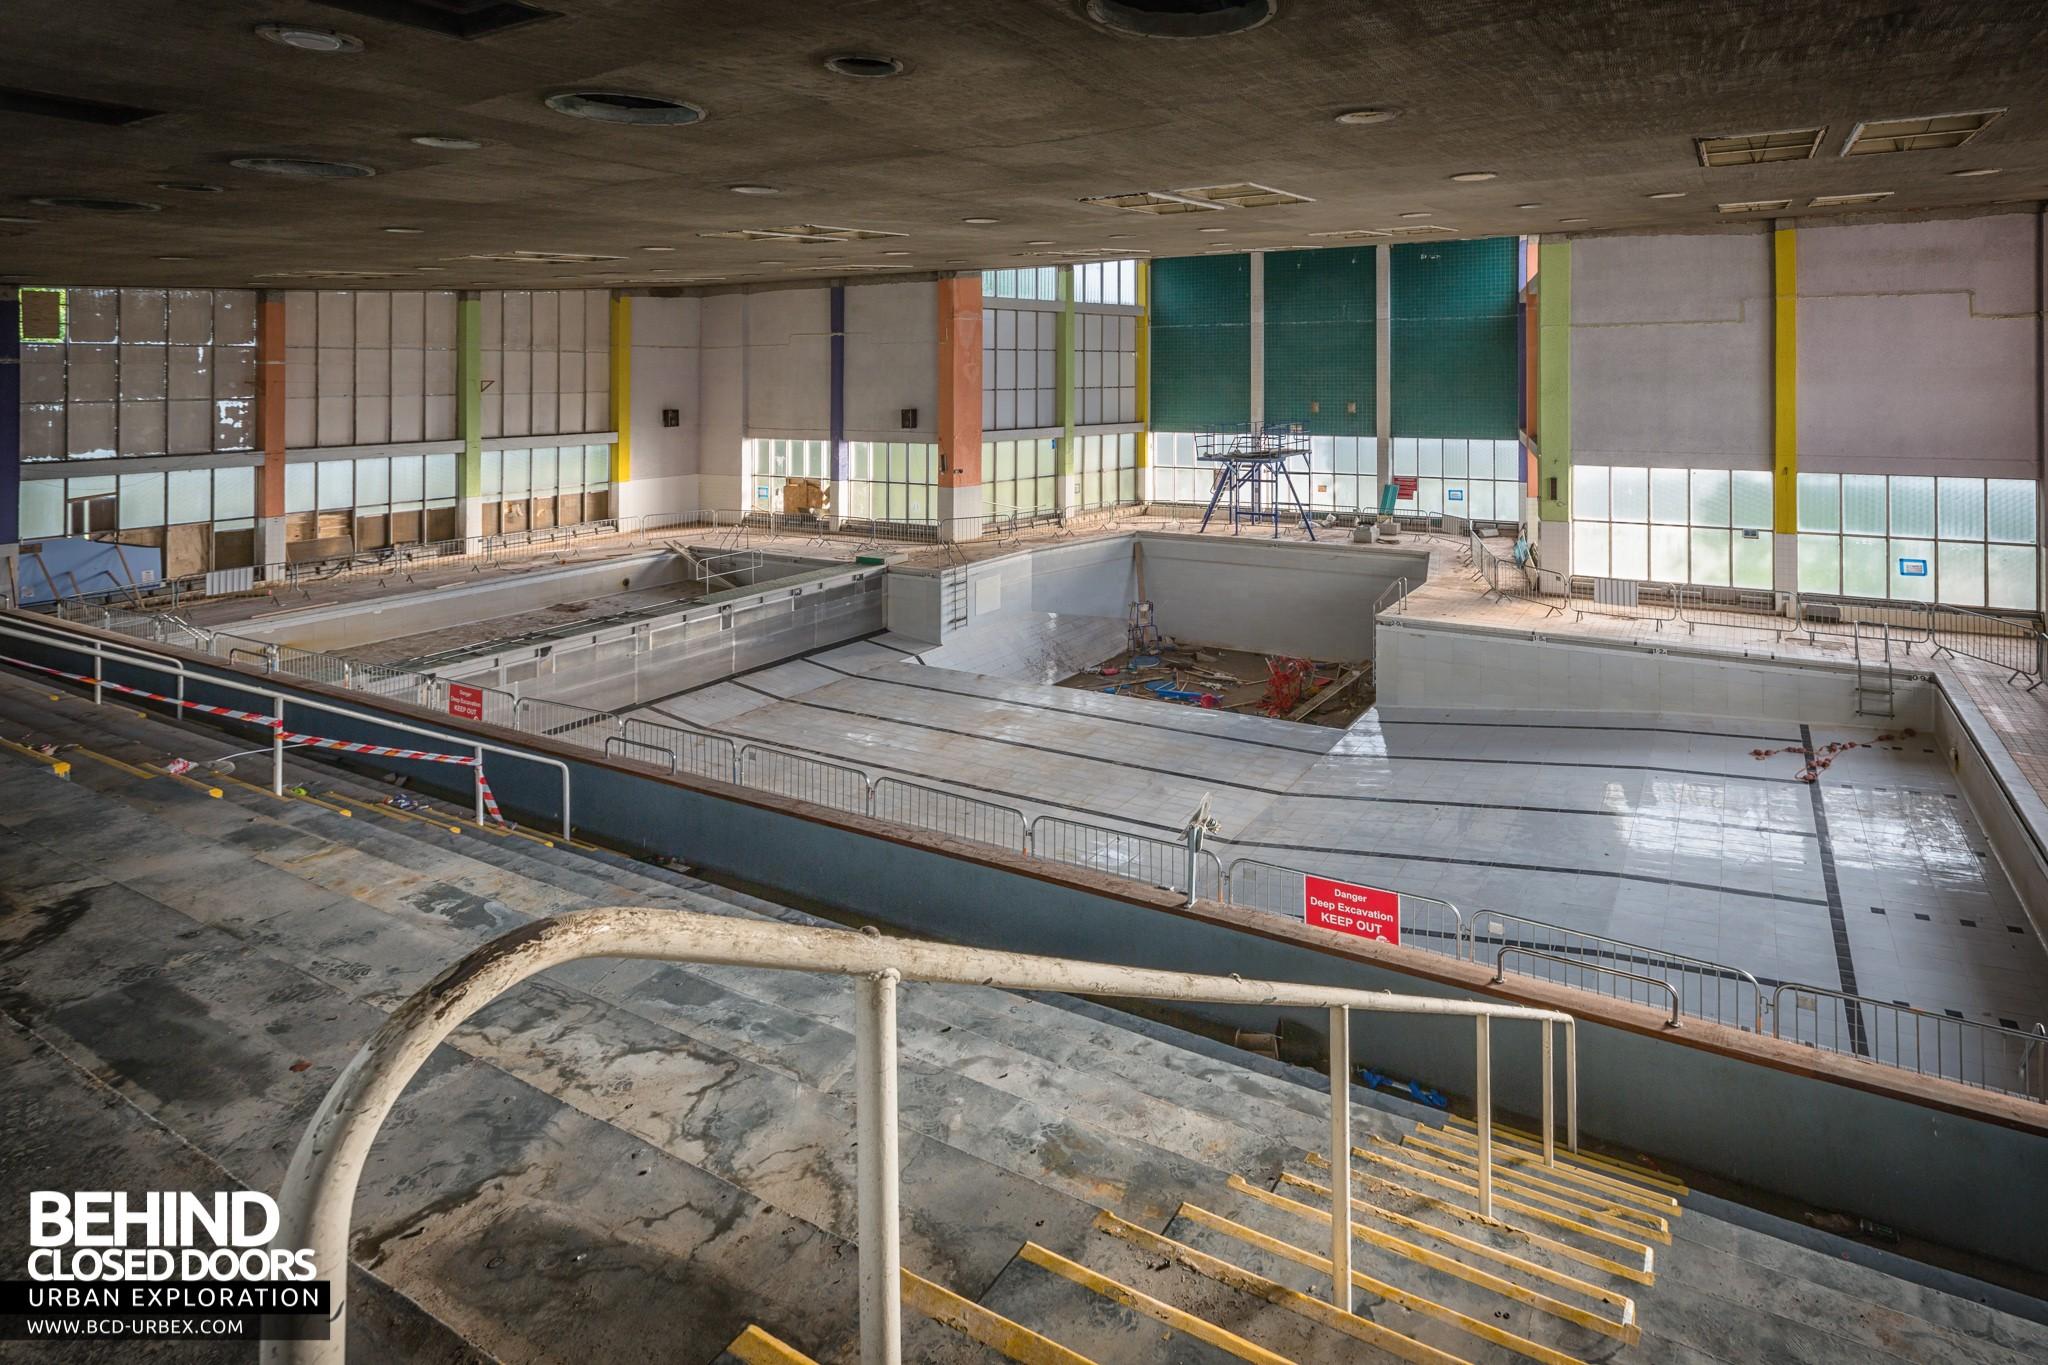 Scartho Baths Swimming Pool Grimsby 187 Urbex Behind